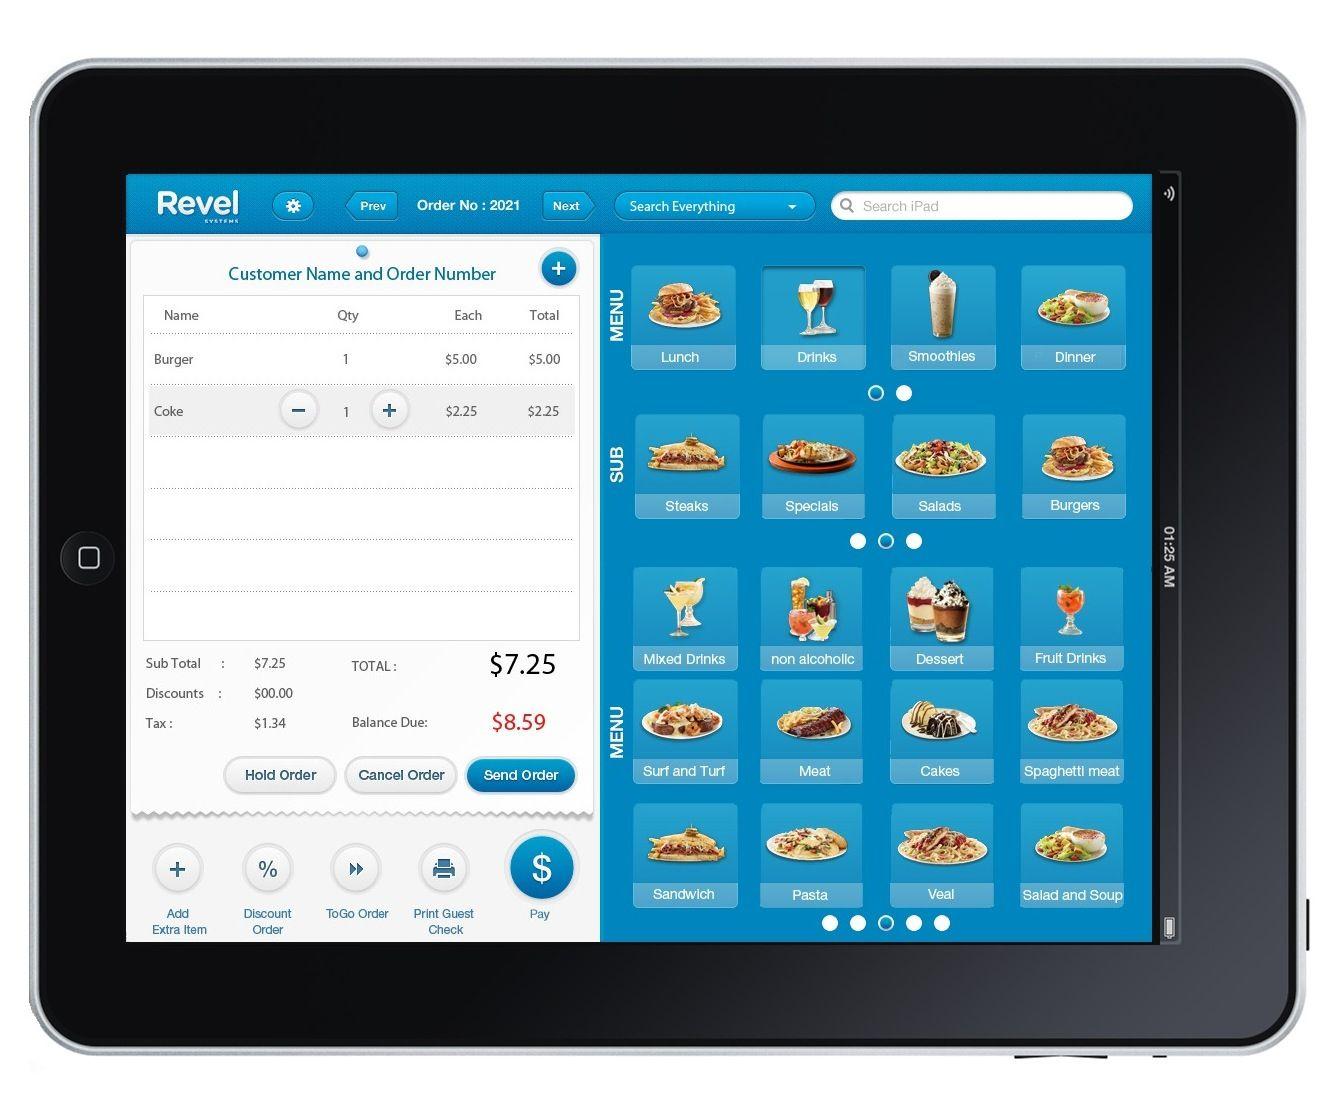 Revel Systems iPad Order Screenshot | TechCrunch